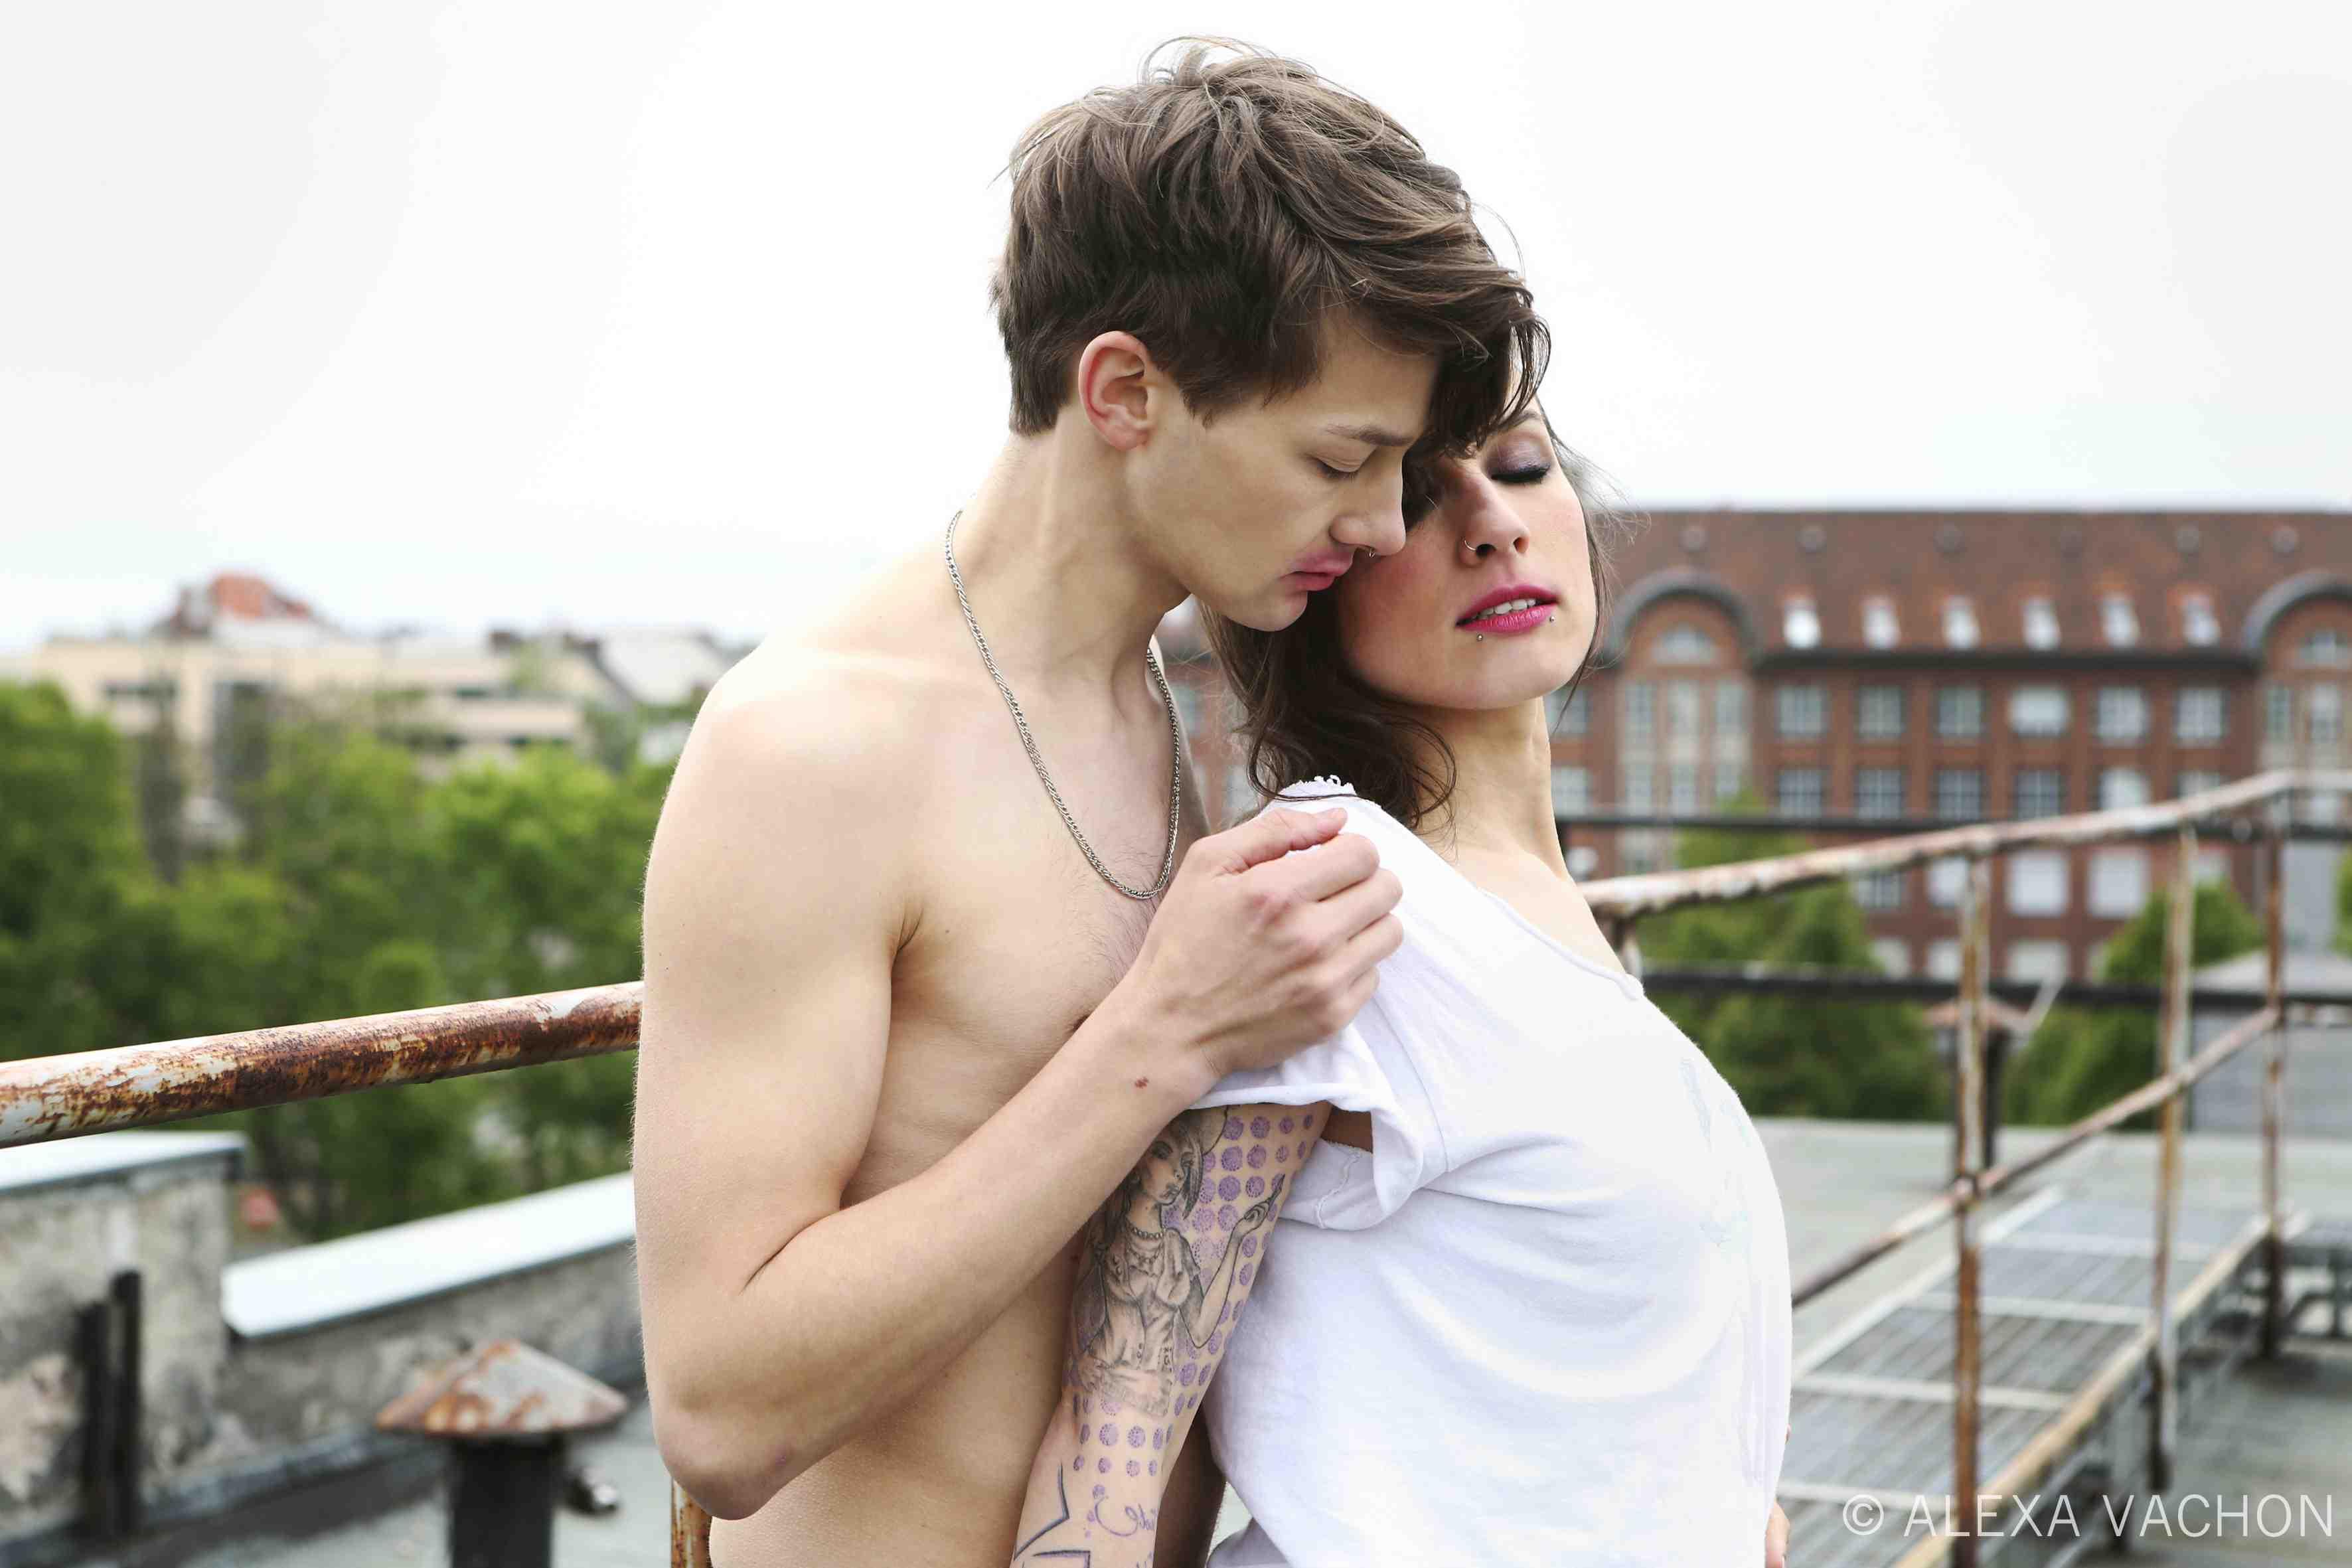 Sasha (Tim Fabian Hoffmann) and Magda (Sookee). Used with permission.